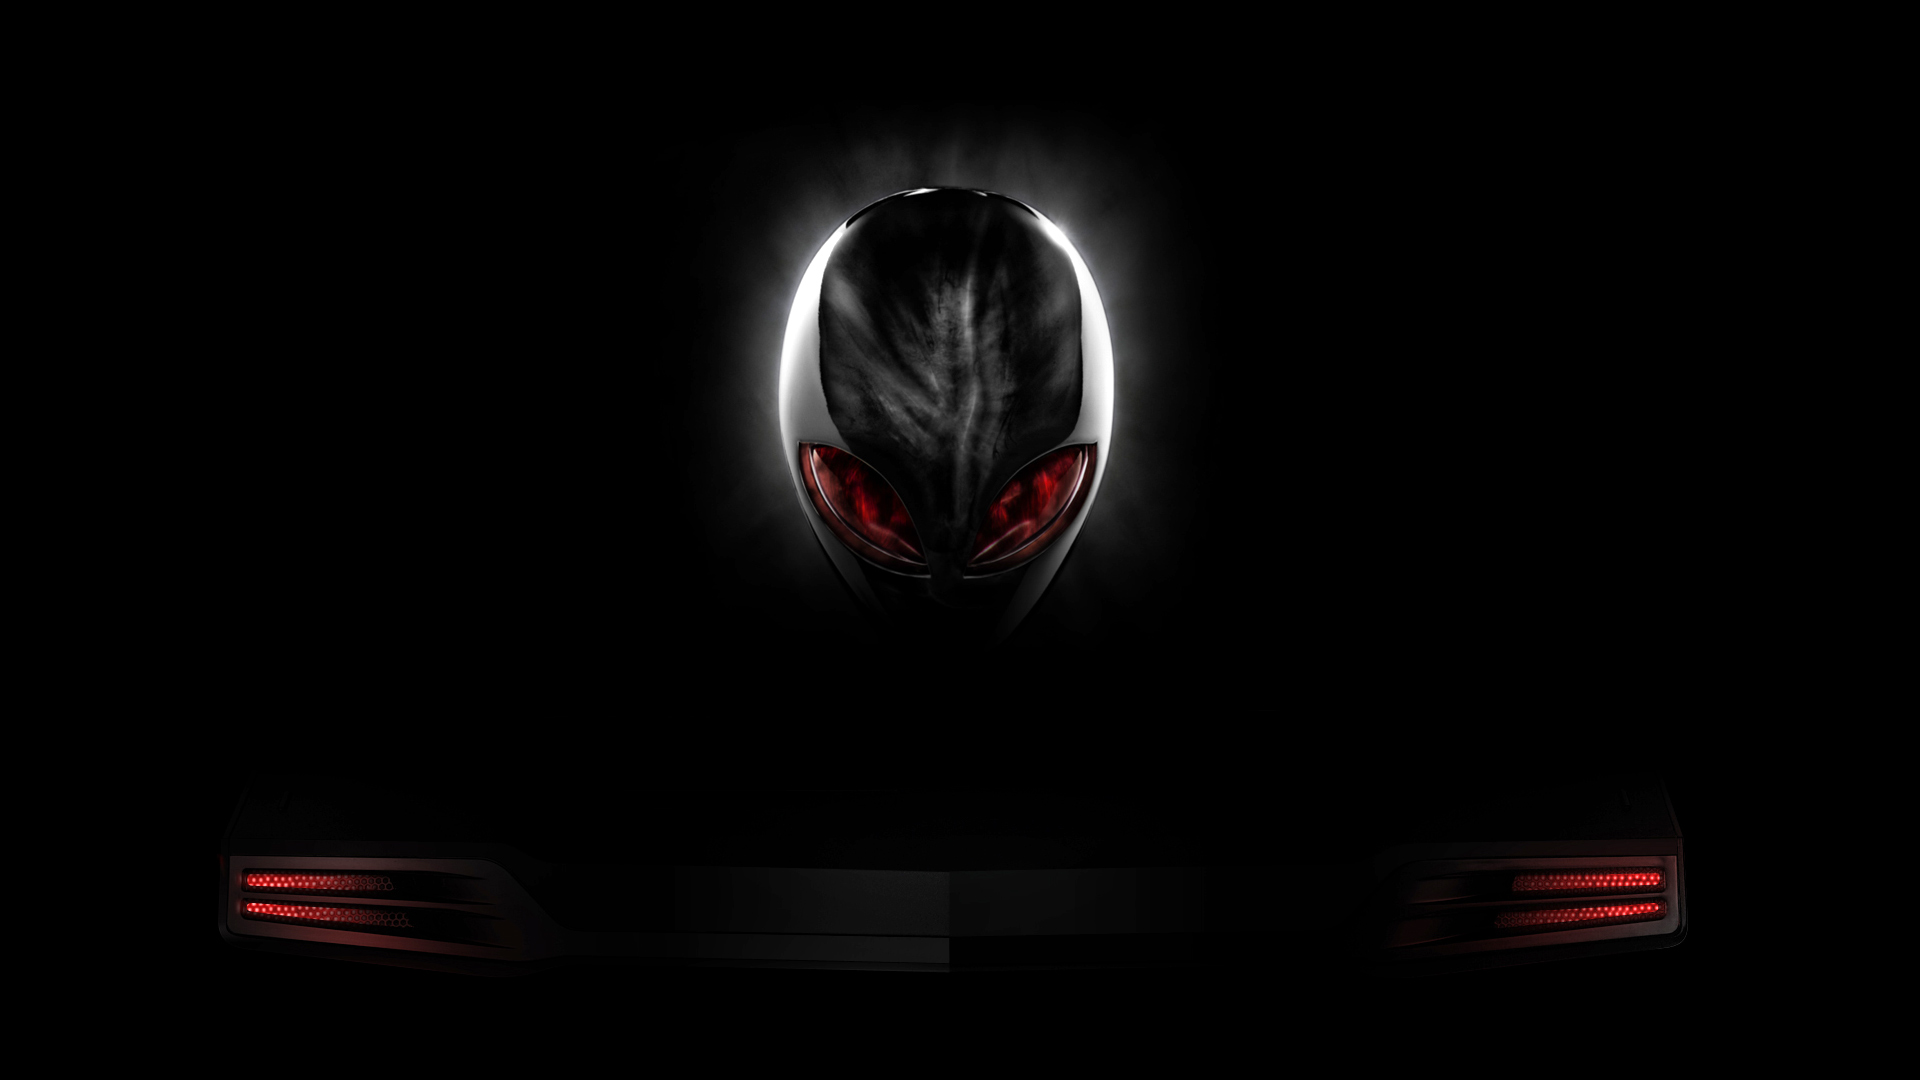 red eyes logo black background hd